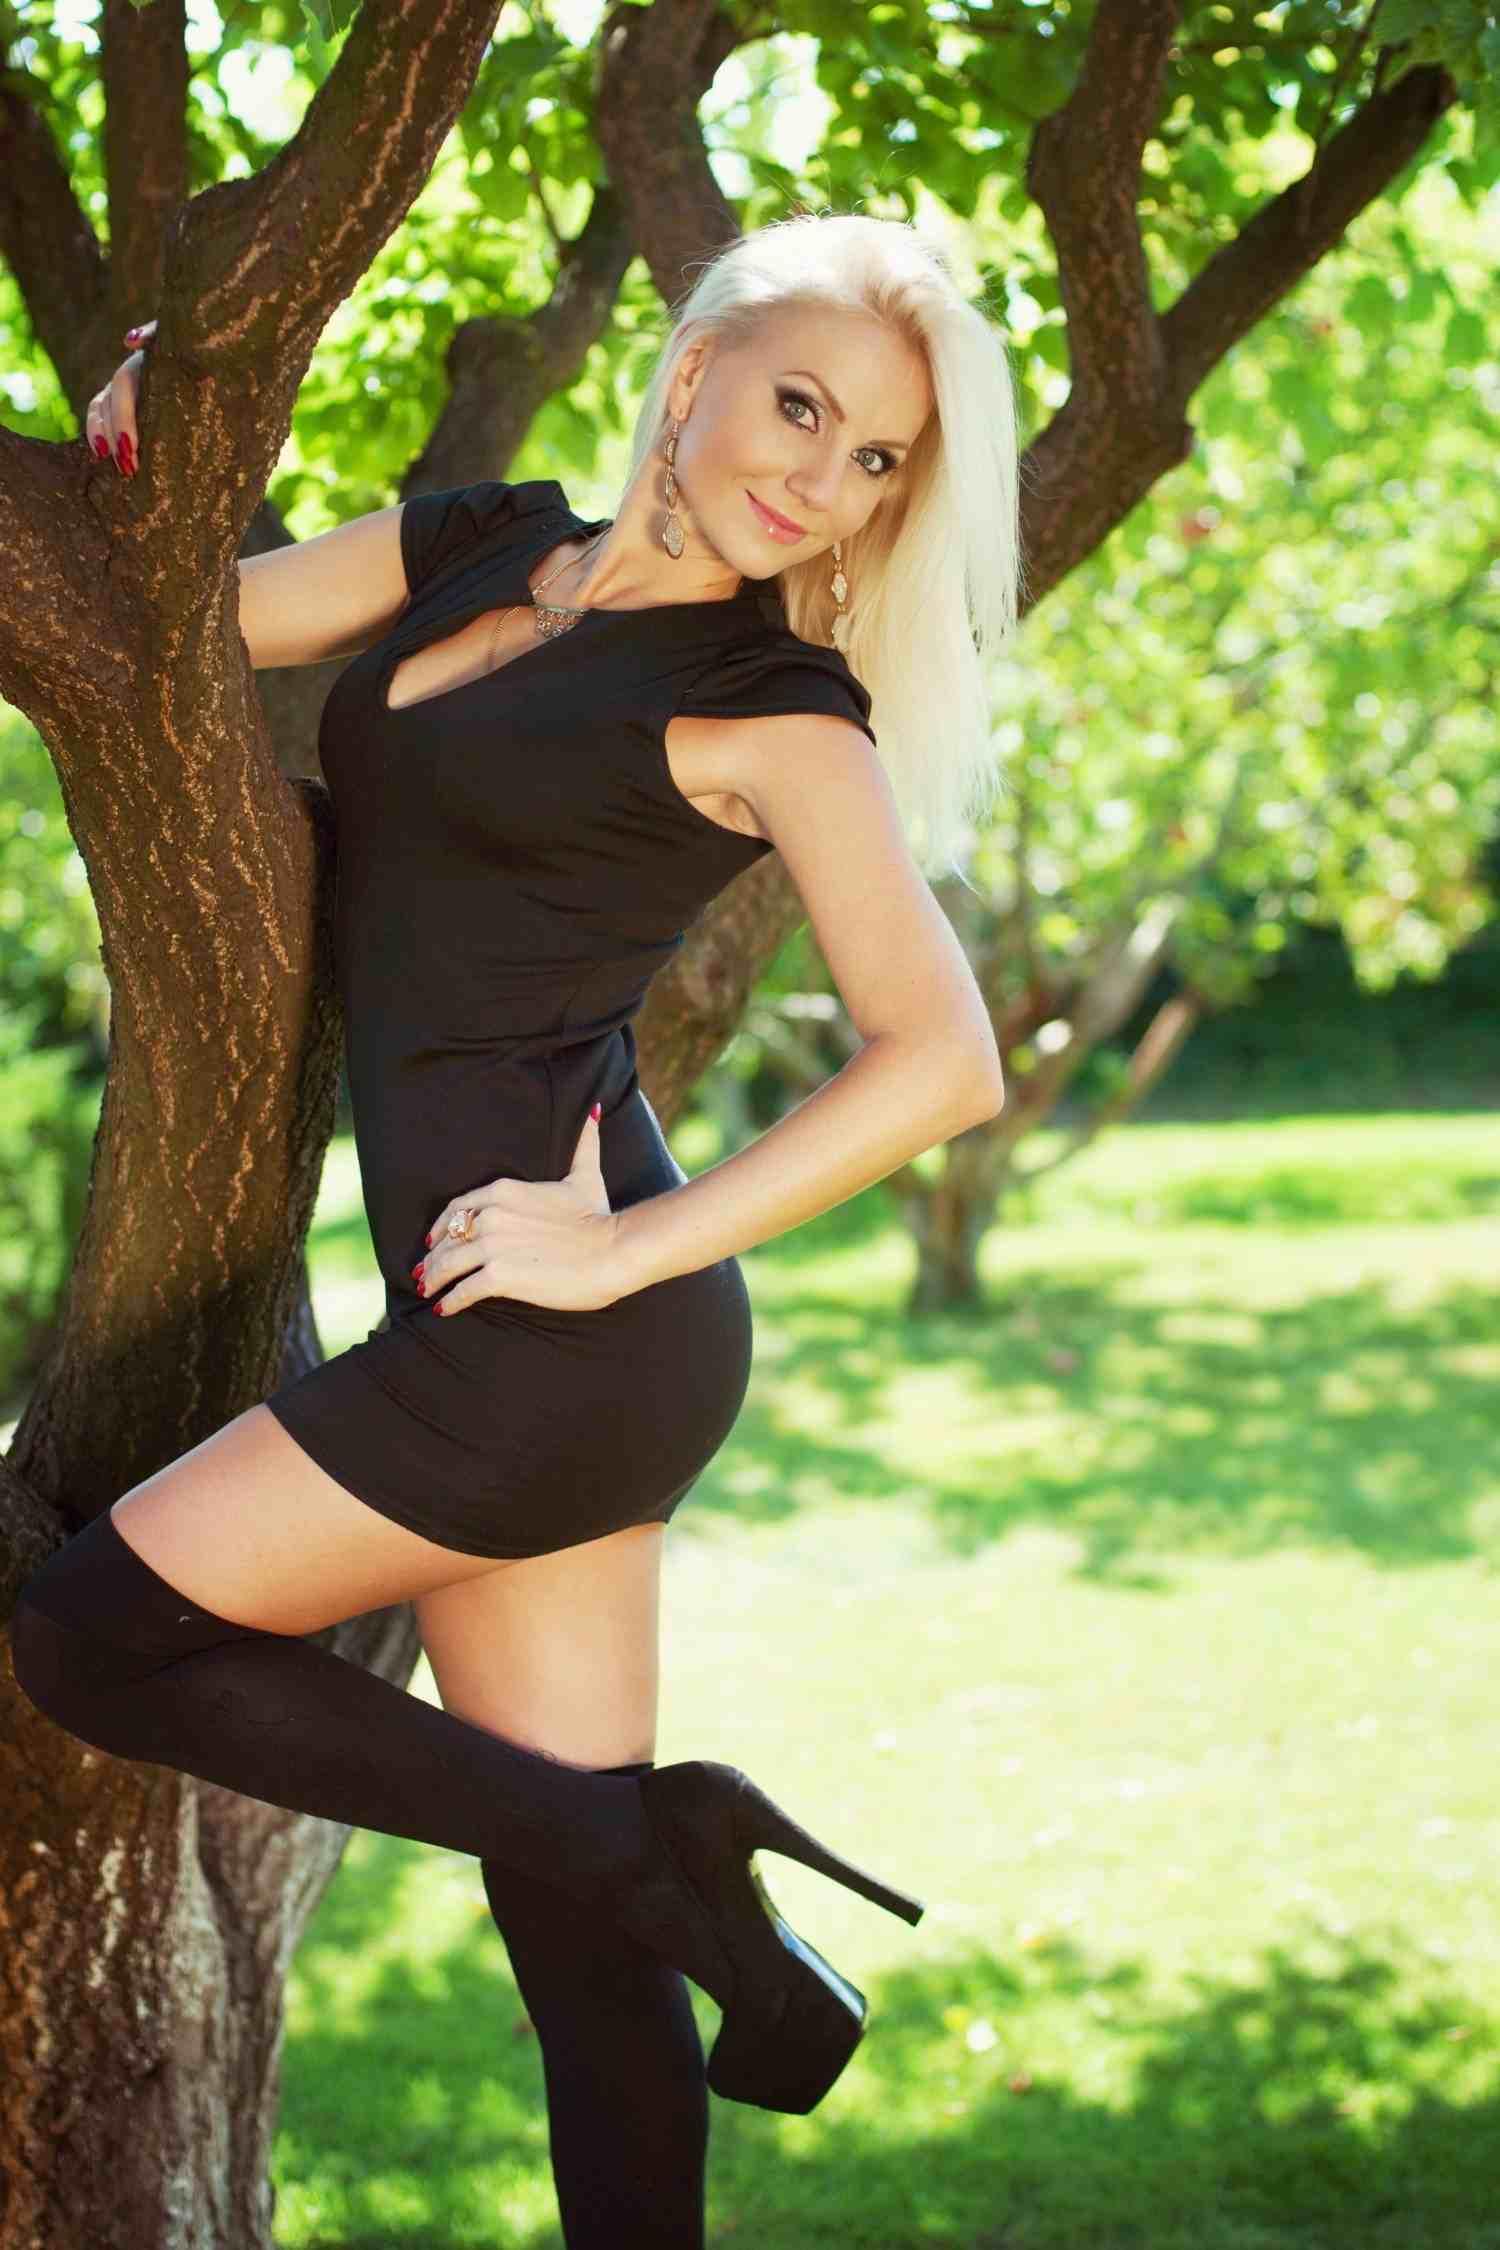 BlondeRousse